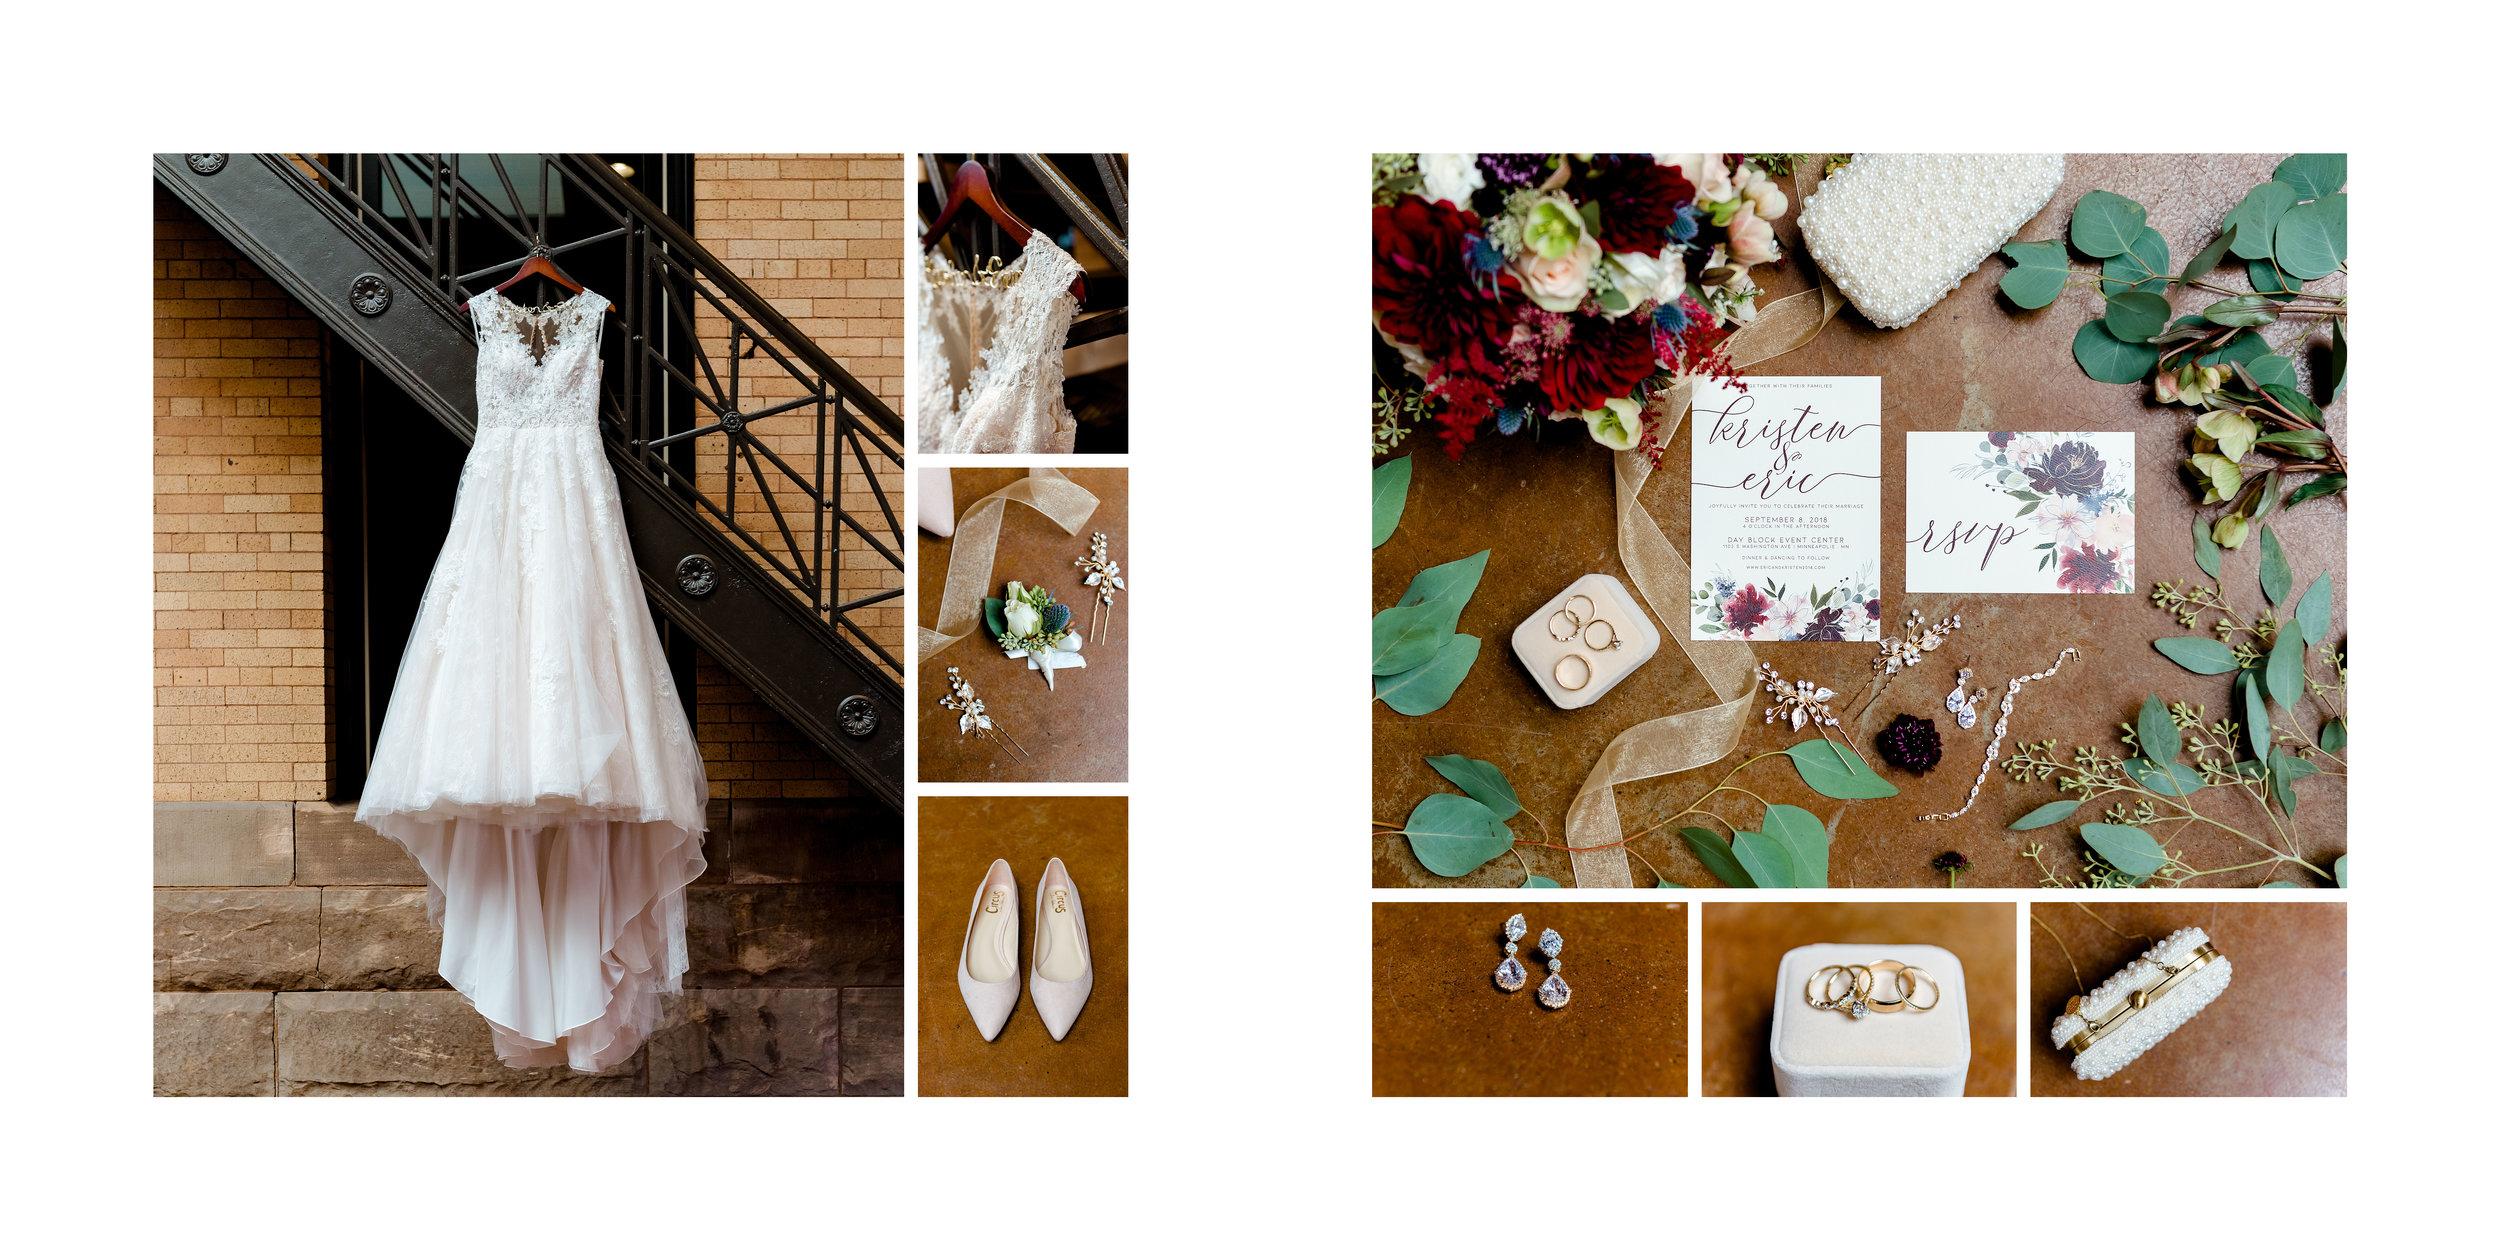 Kristen + Eric - Wedding Album Sample_05.jpg